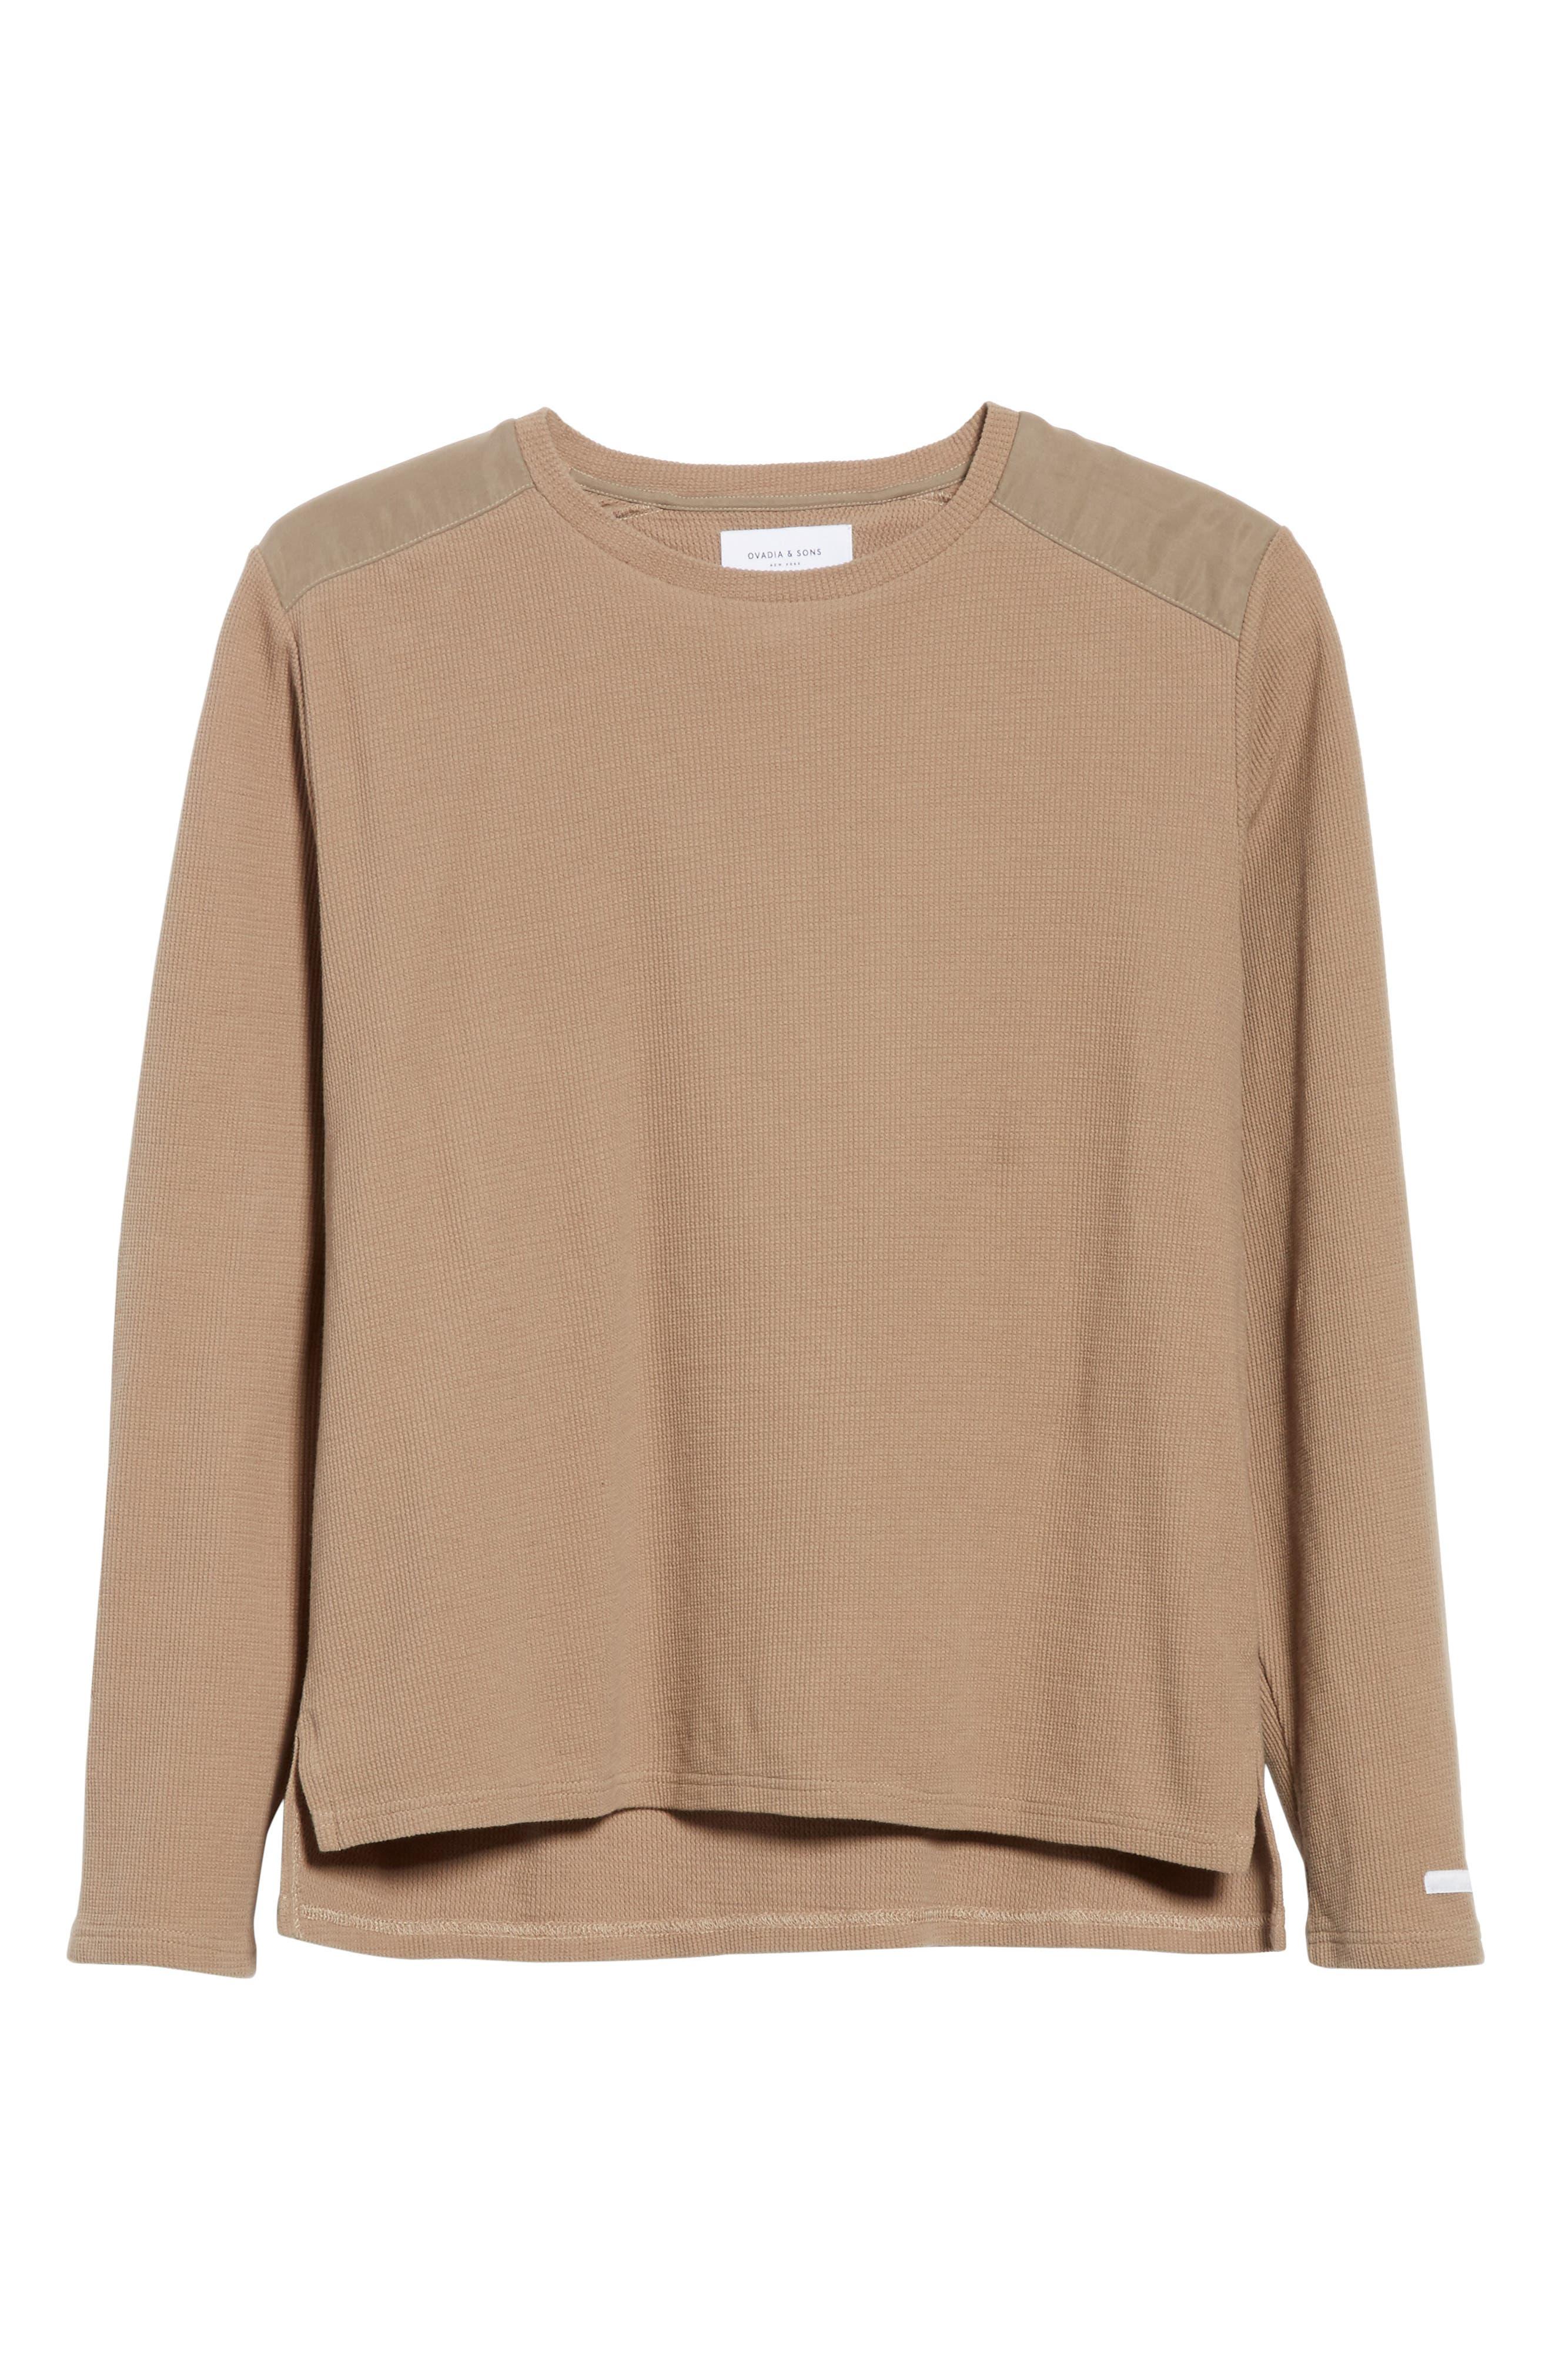 Crewneck Sweater,                             Alternate thumbnail 6, color,                             Mushroom